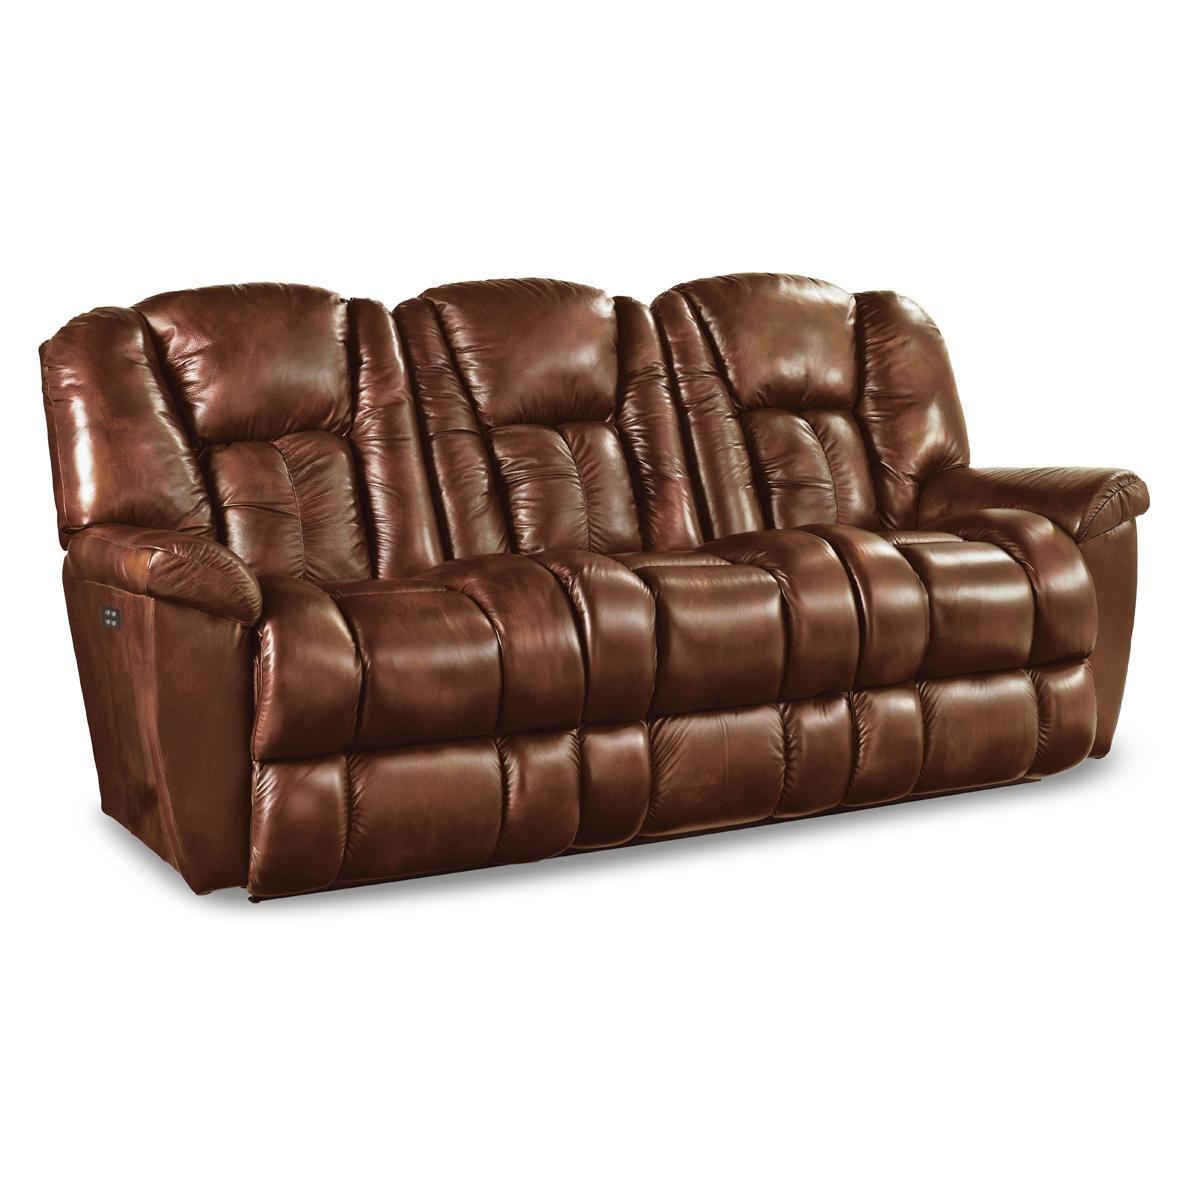 La-Z-Boy Power Leather Motion Sofa in Brown | Nebraska ...